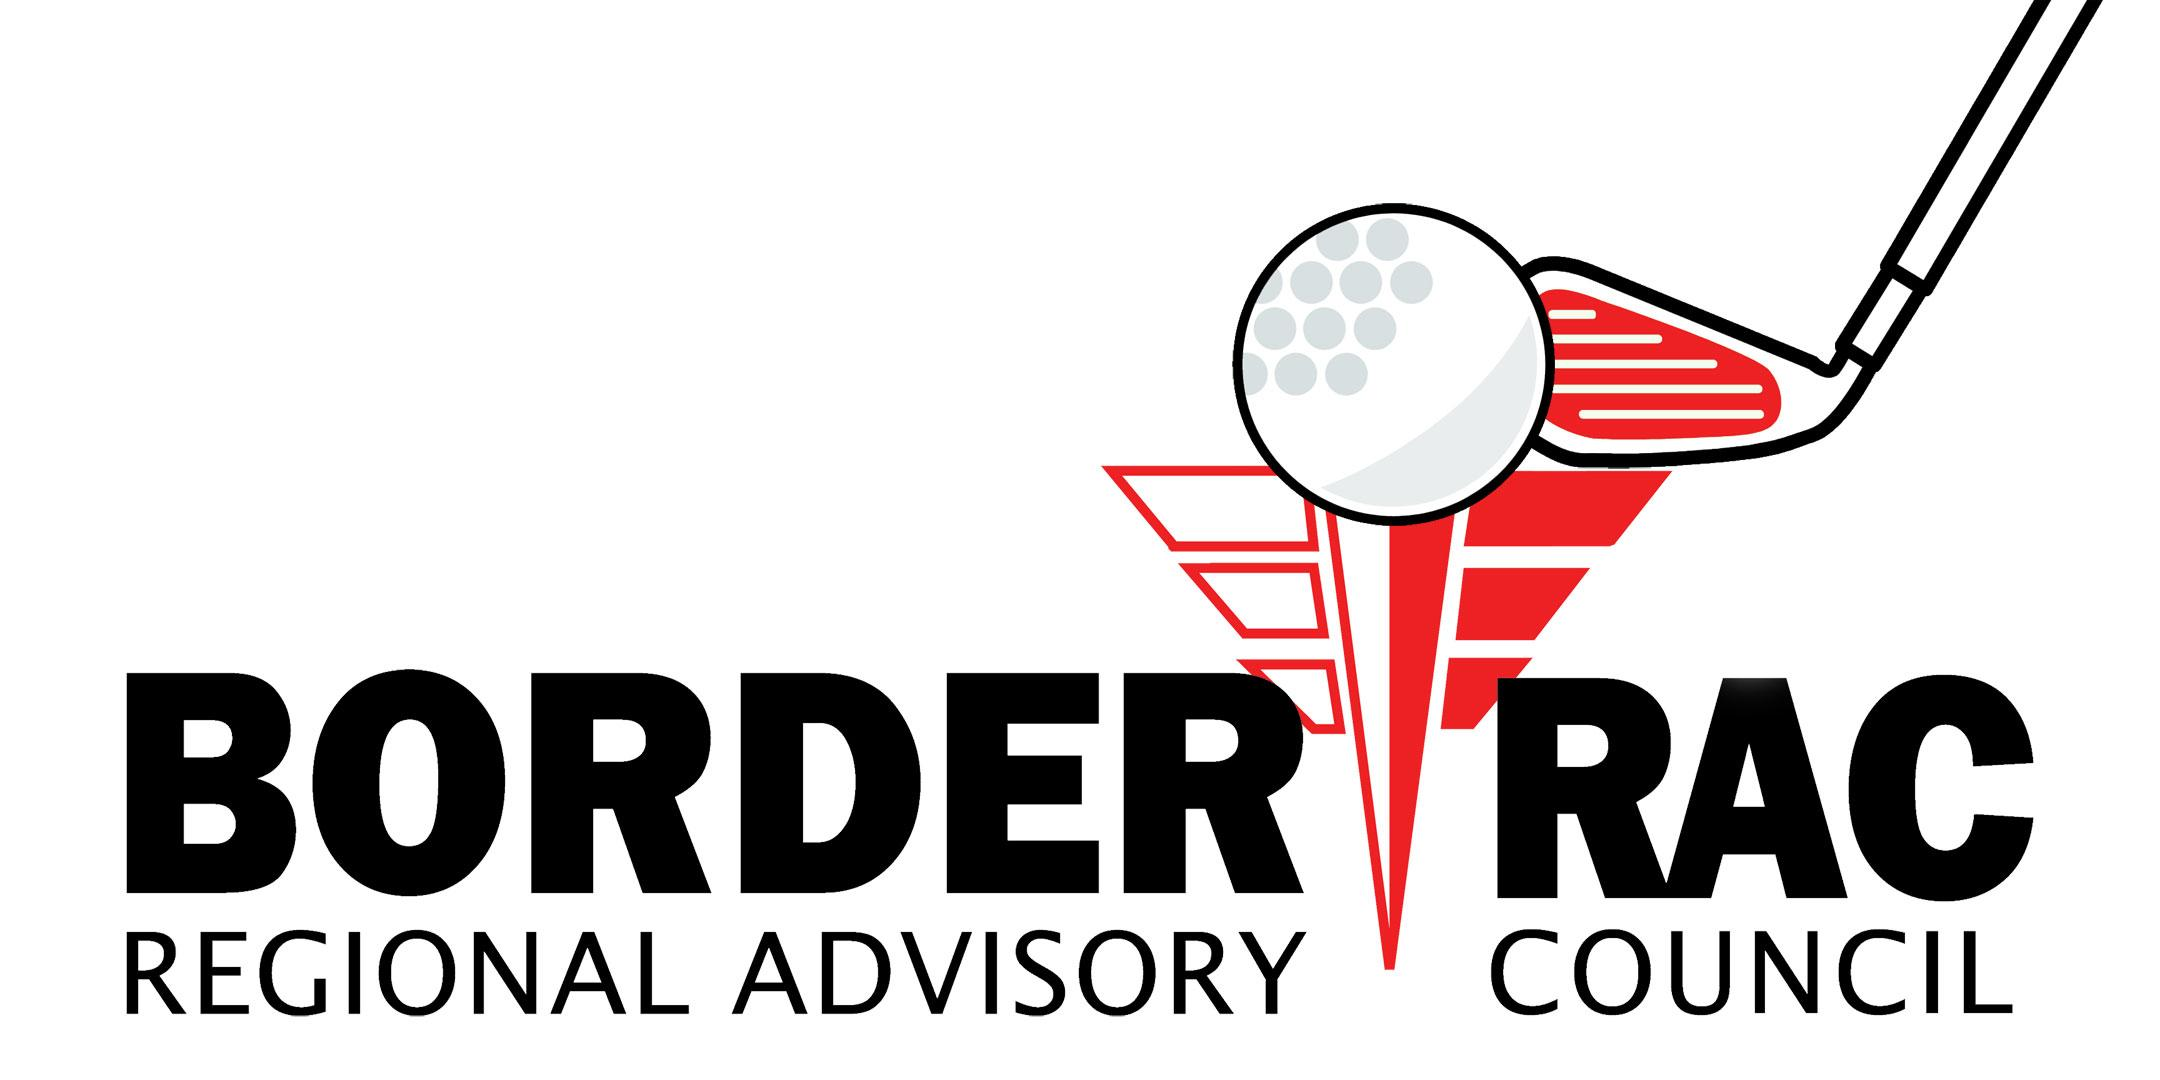 BorderRAC 2nd Annual Topgolf Fundraiser